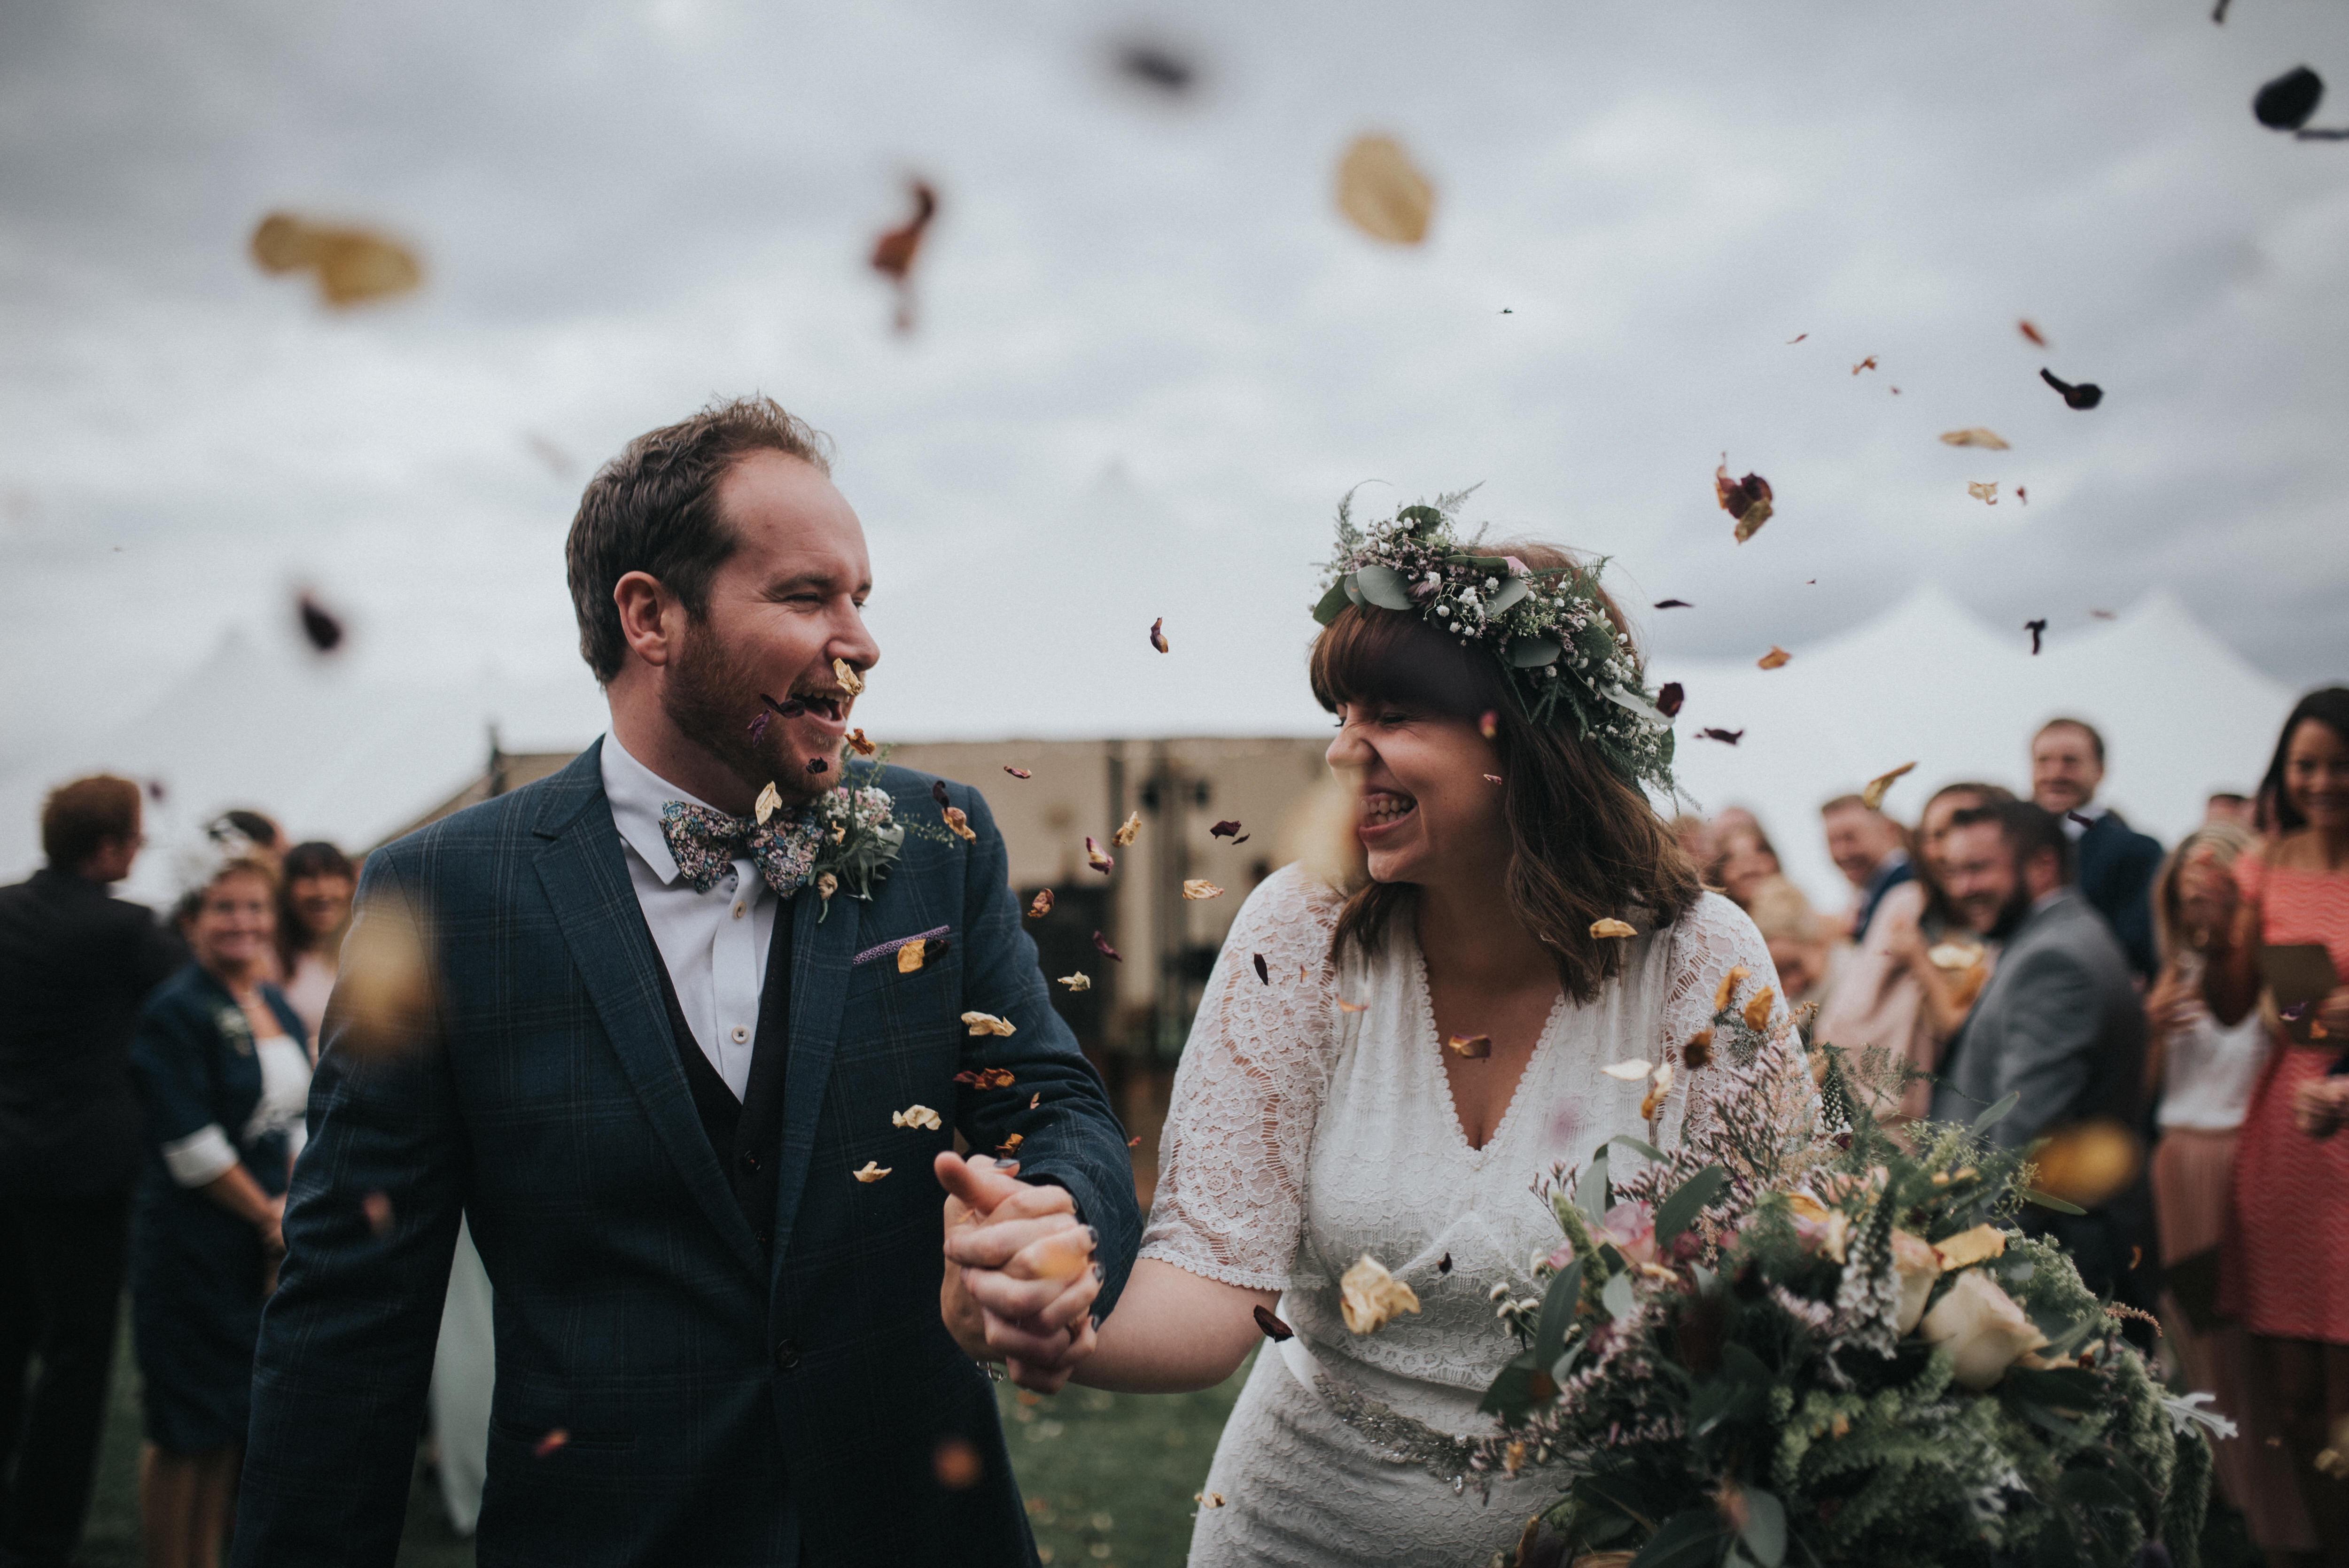 Samantha Kelsie UK Celebrant wedding ceremony blessing family funeral marriage destination international Europe Asia